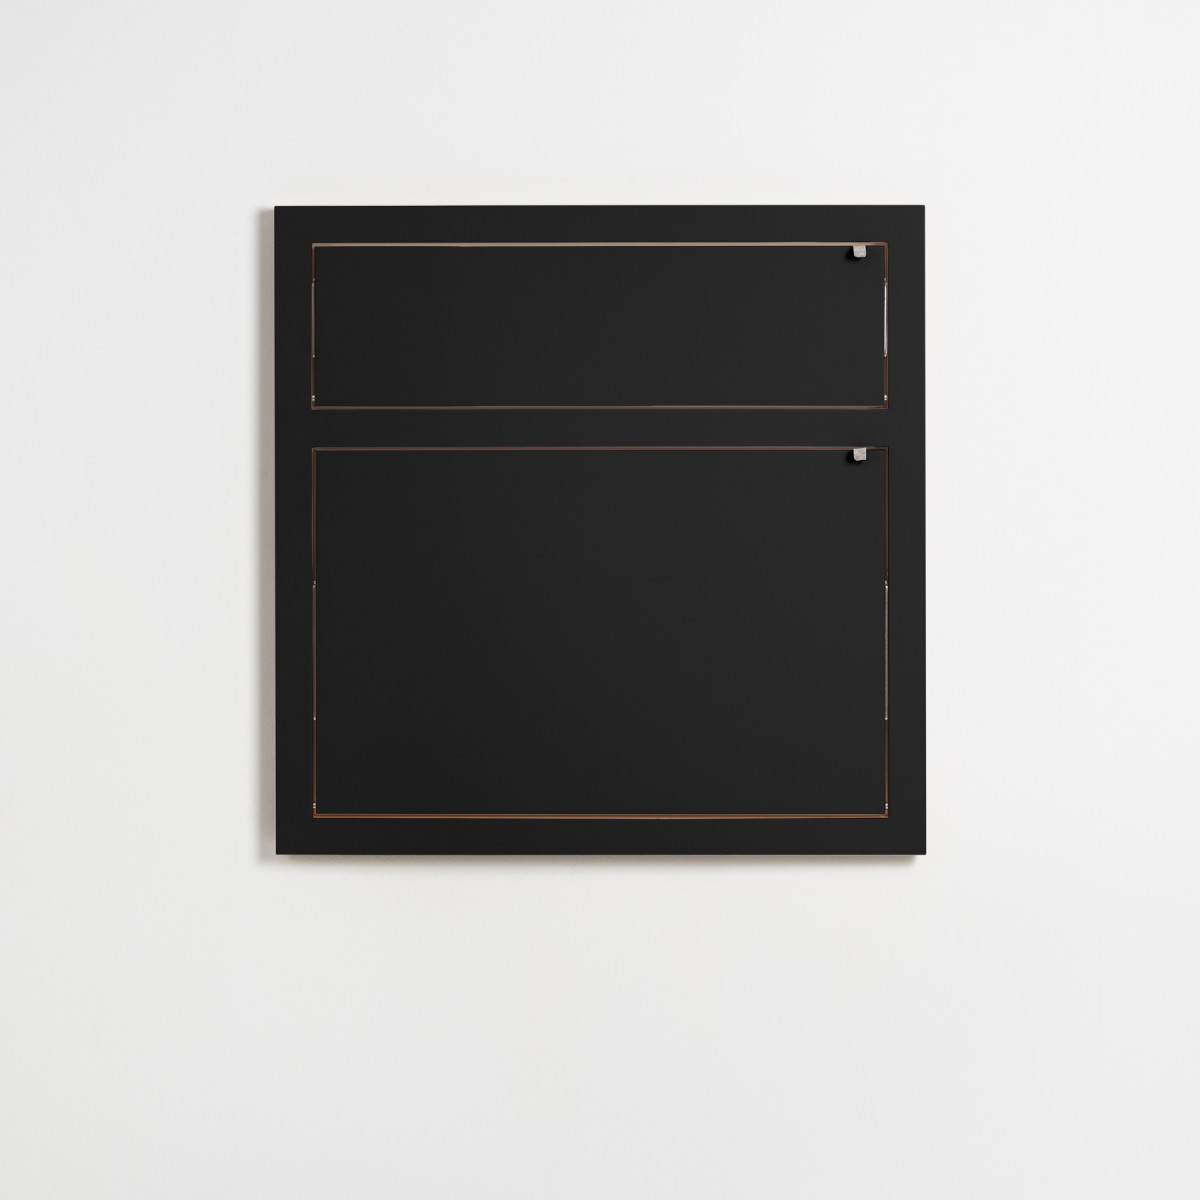 AMBIVALENZ Fläpps Sekretär/in 80x80 - 2